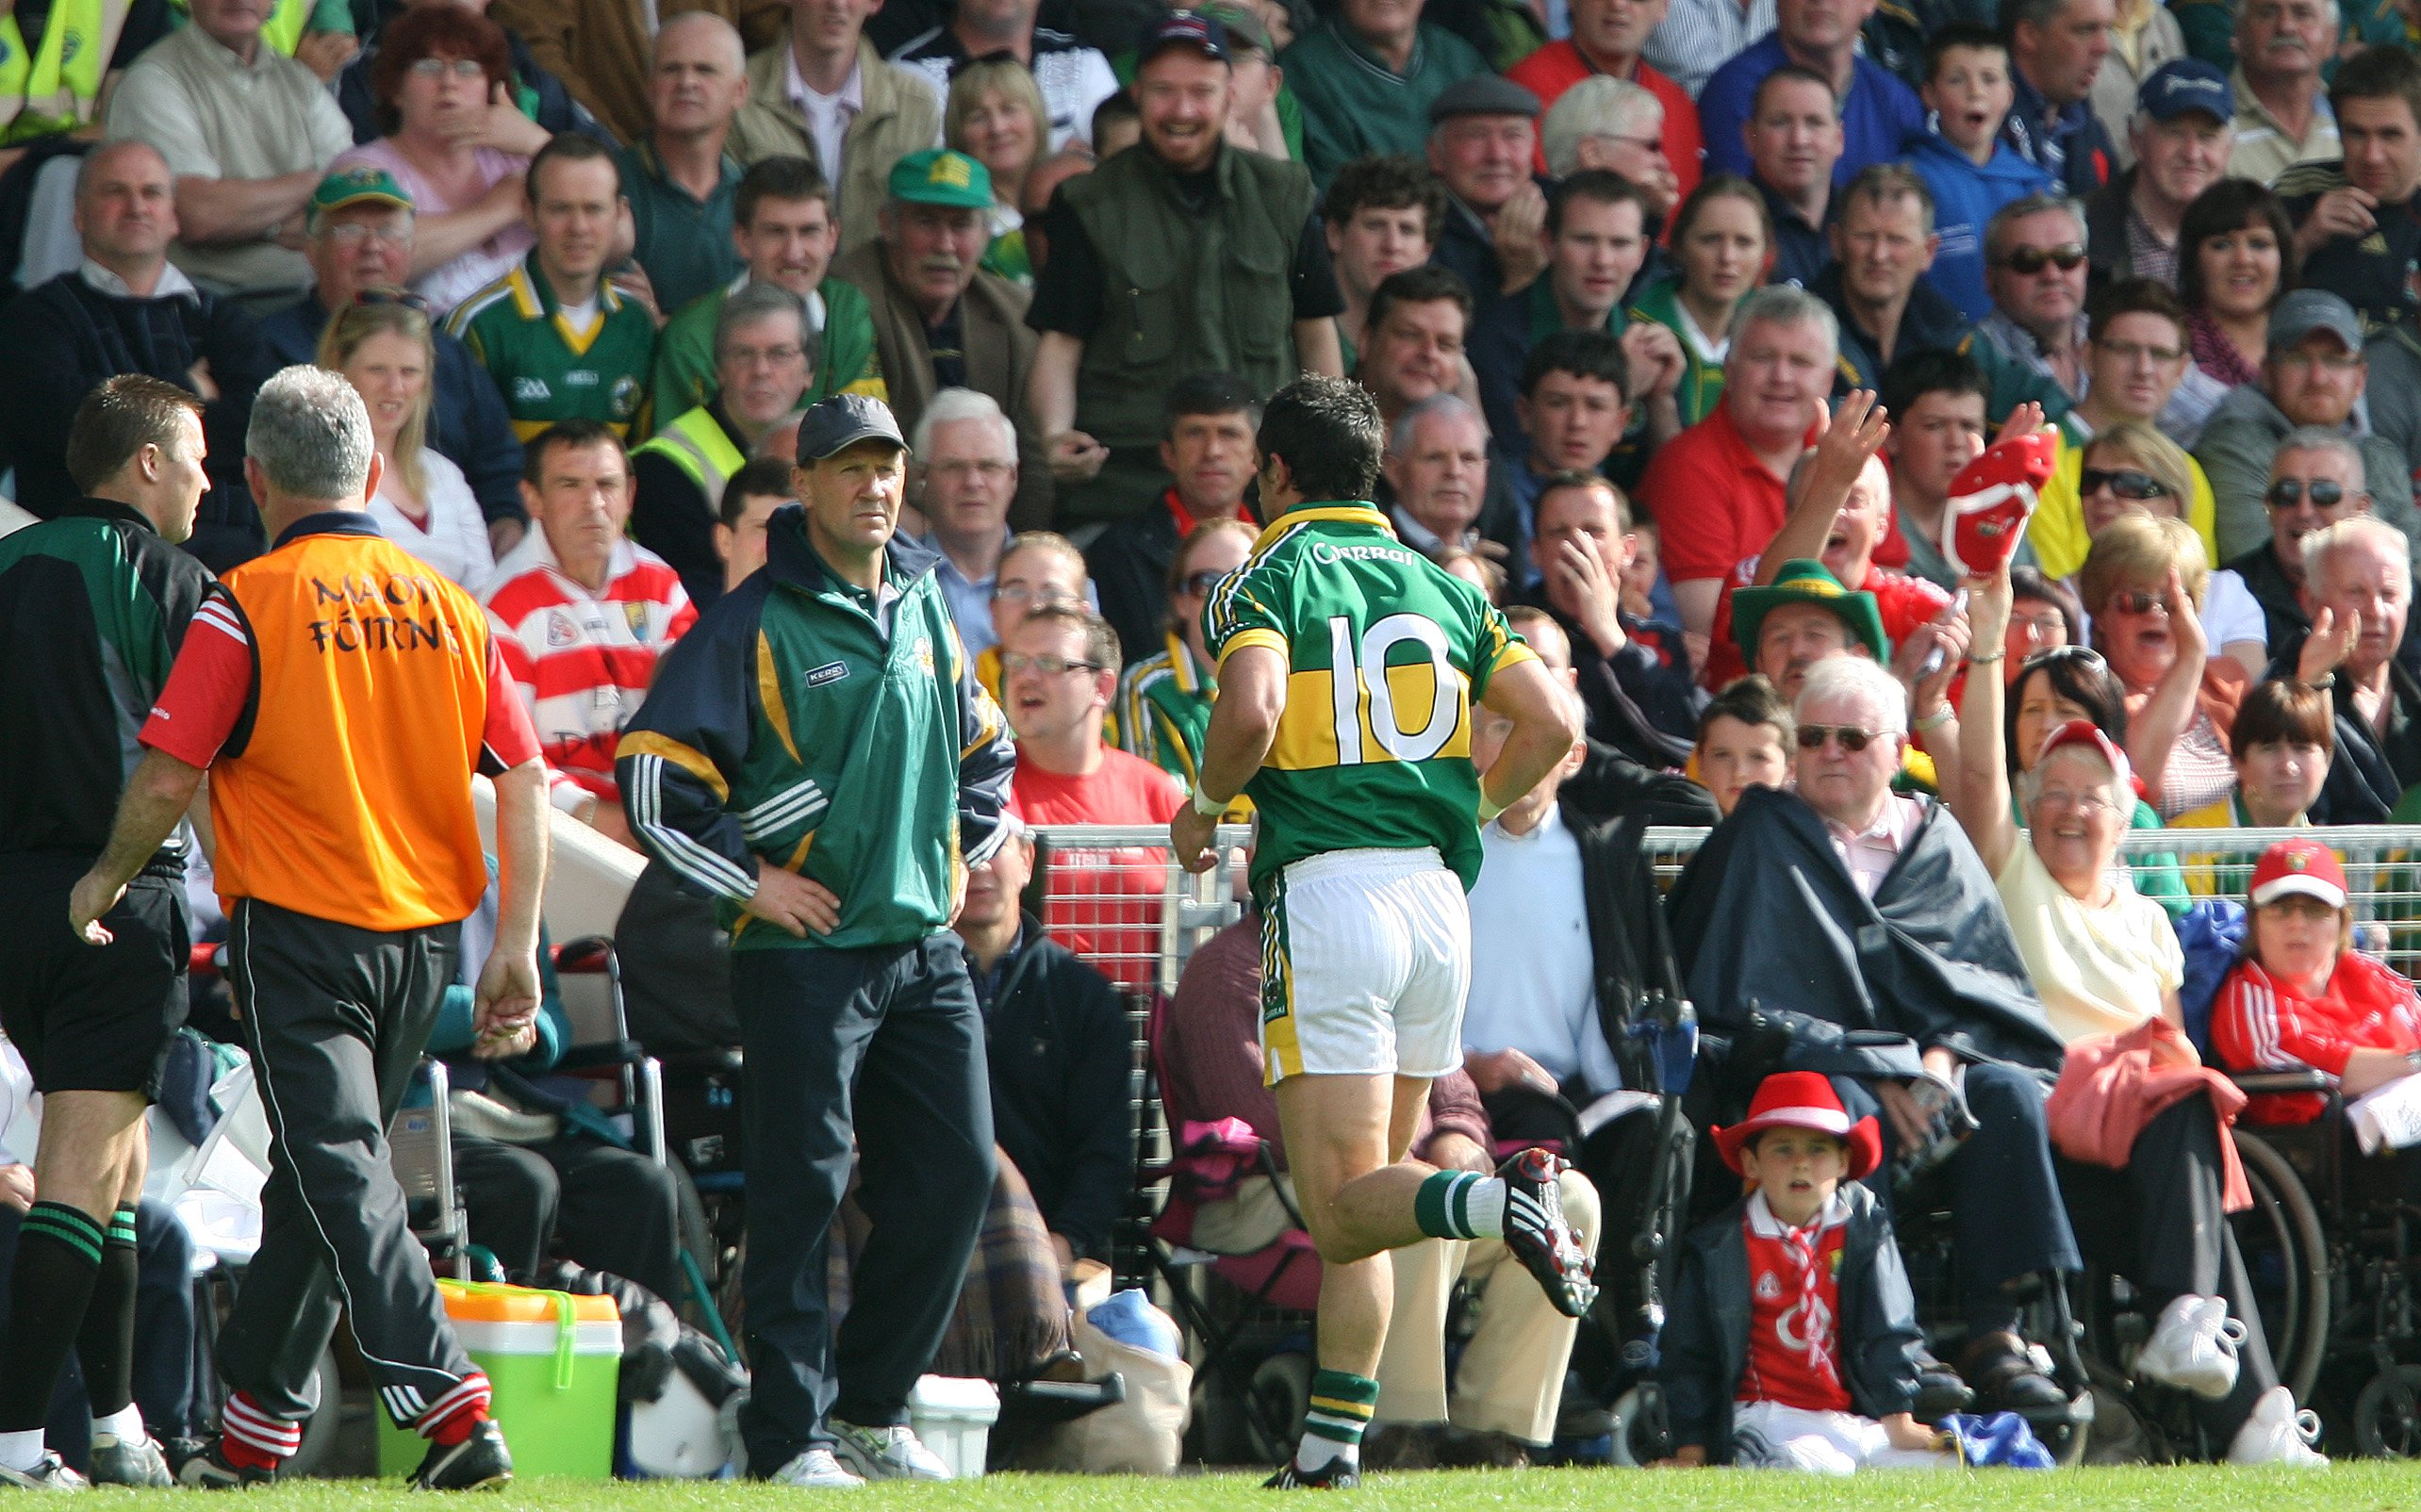 Munster GAA Football Senior Championship Semi-Final Replay 13/6/2009 Cork vs Kerry Kerry's Paul Galvin is sent off by referee Pat McEneaney Mandatory Credit ©INPHO/Lorraine O'Sullivan